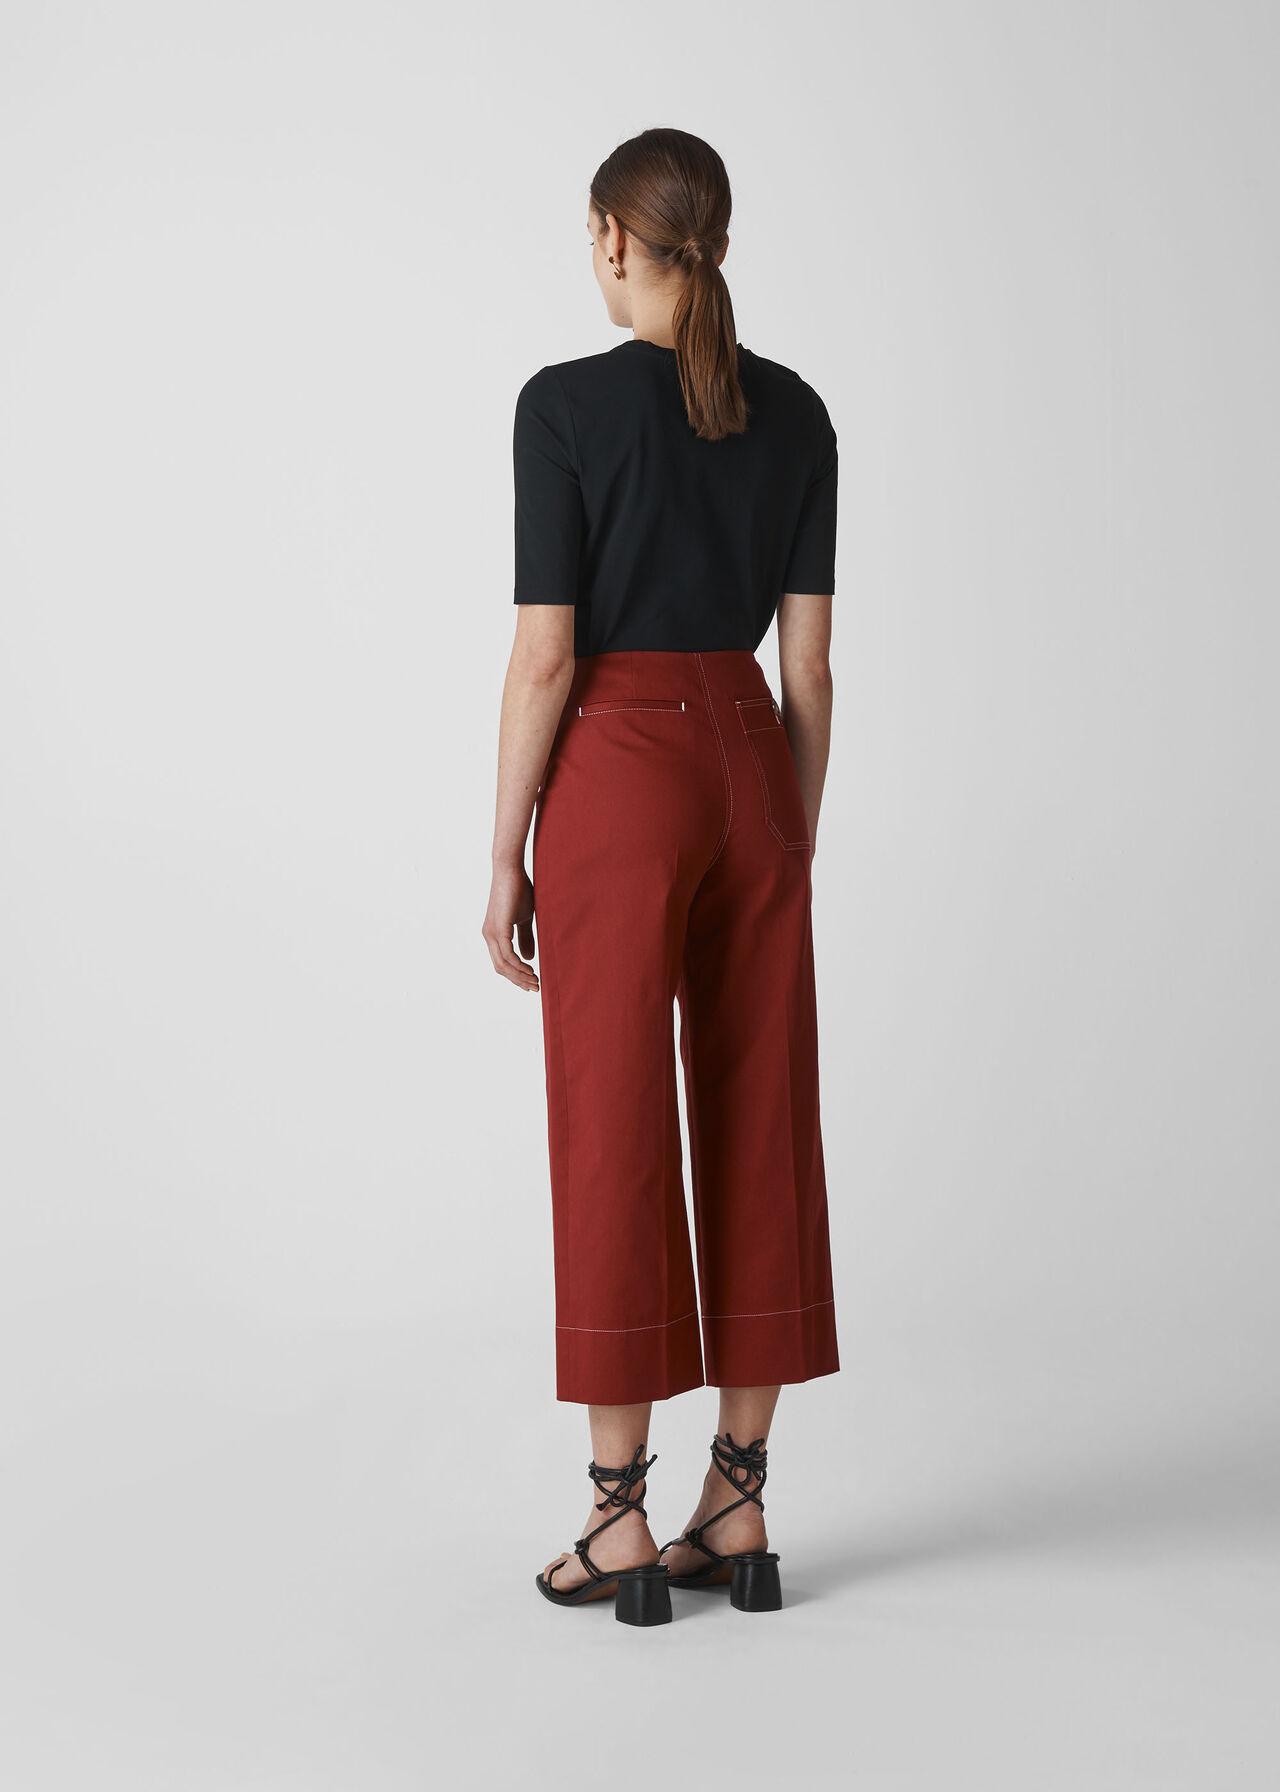 Heidi Button Front Trouser Rust